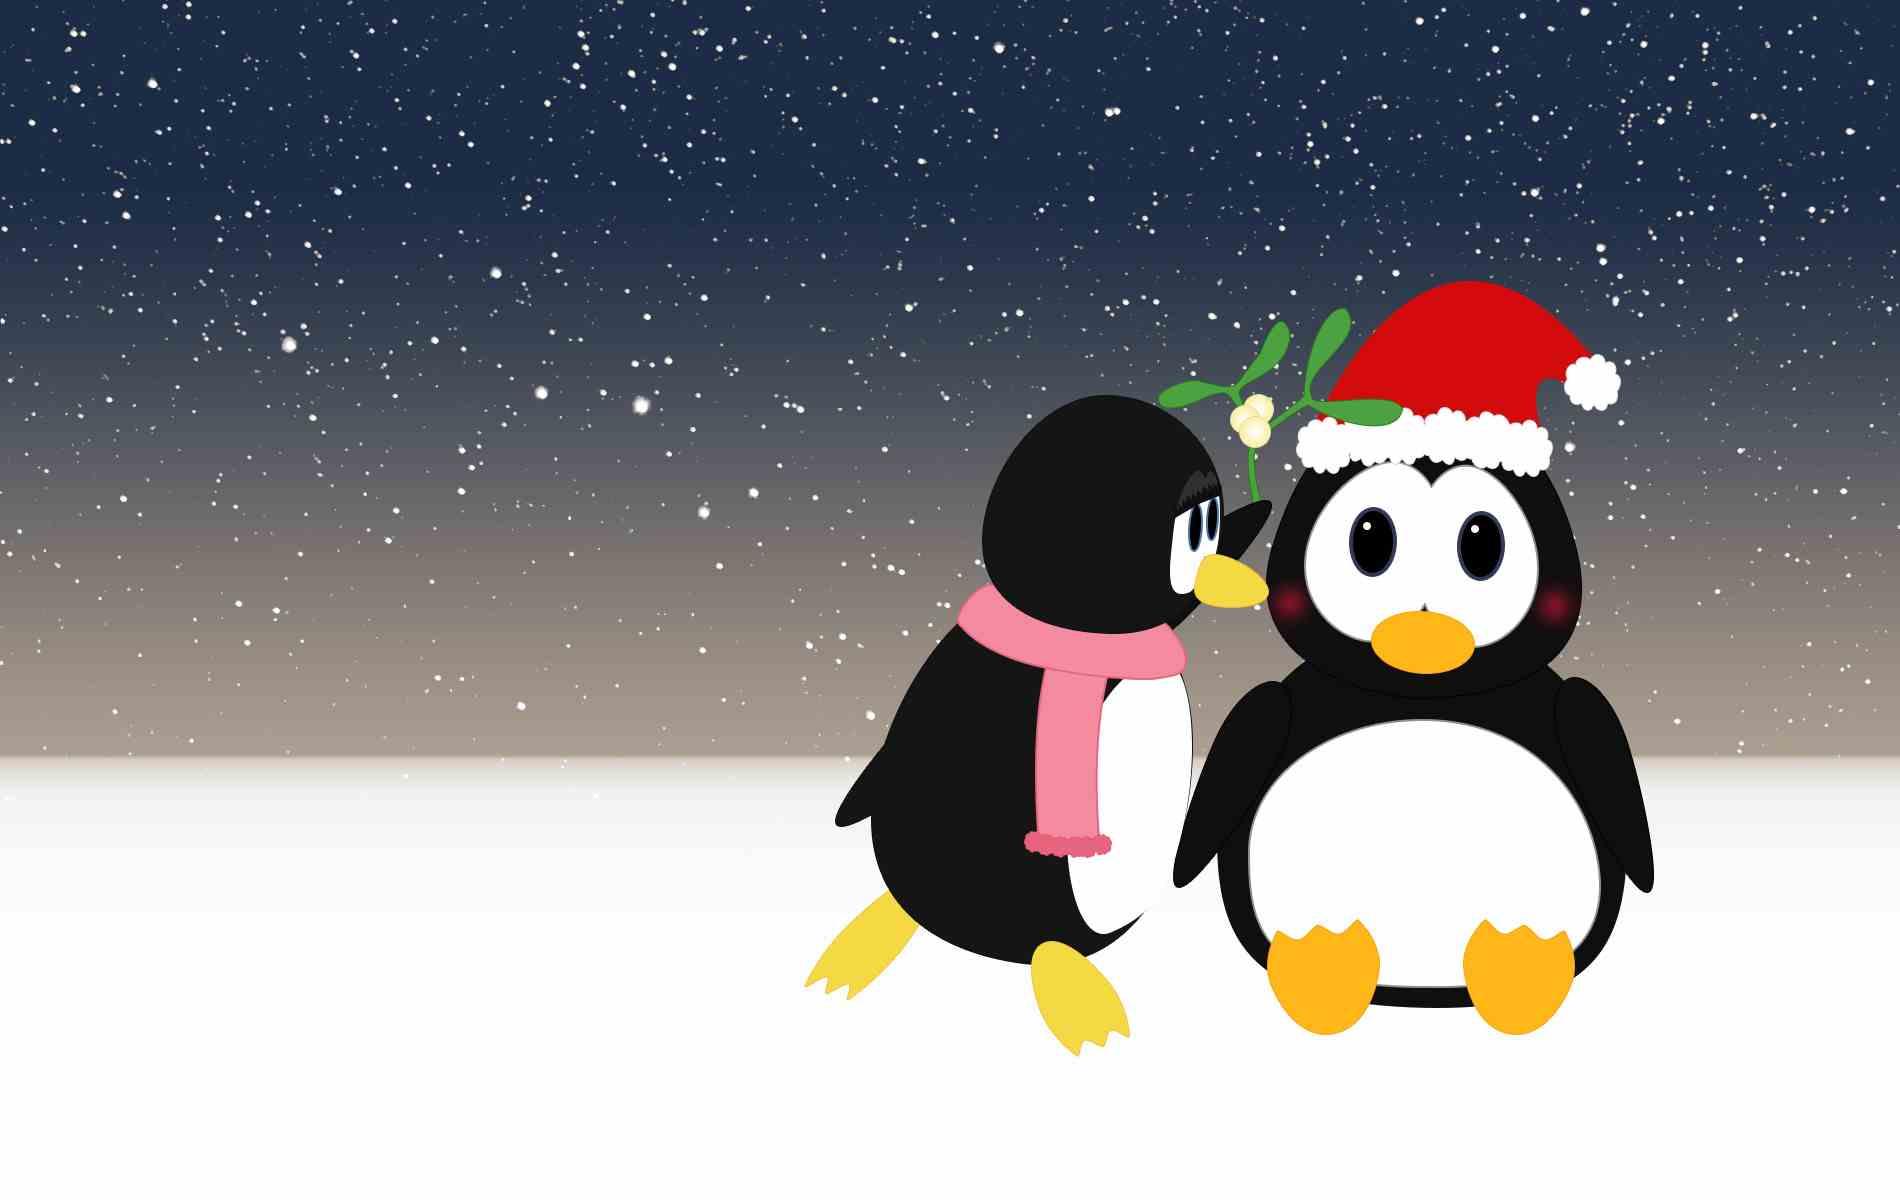 cute Penguin Love Wallpaper : cute Penguin Backgrounds - WallpaperSafari